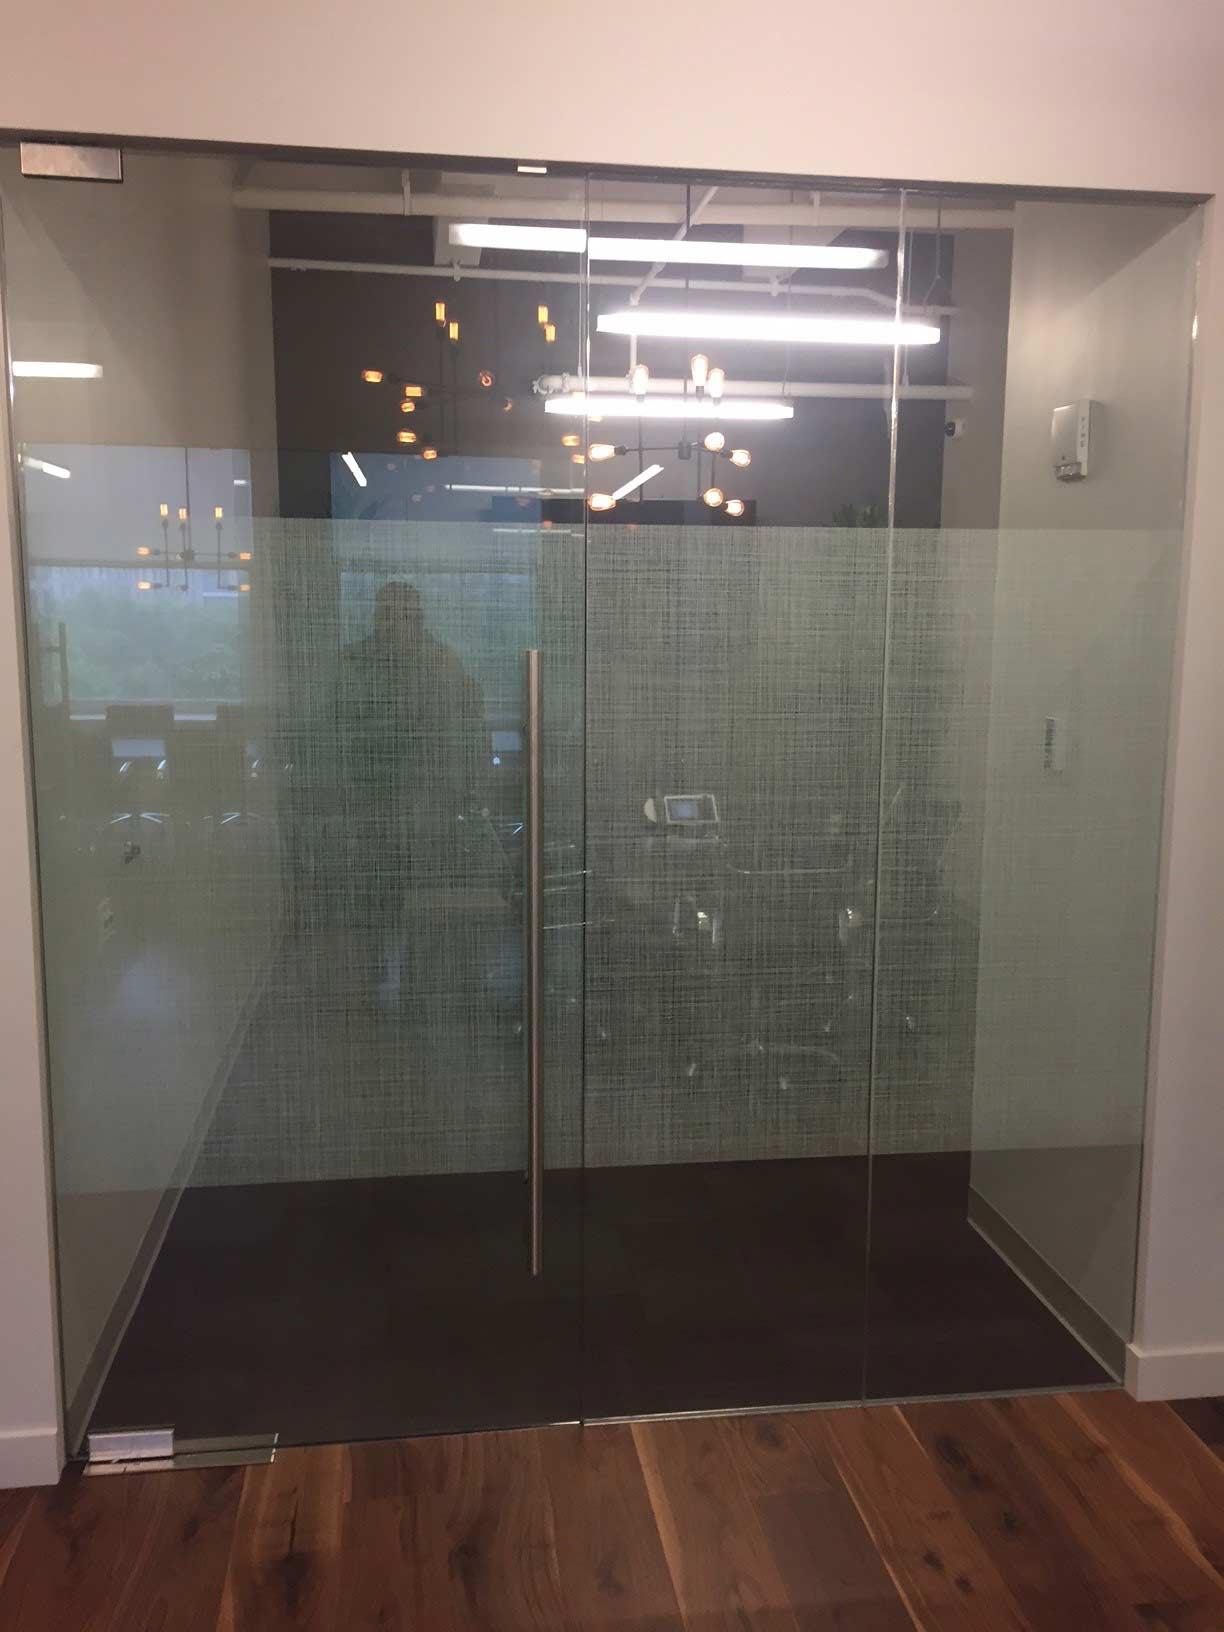 distraction band on glass door